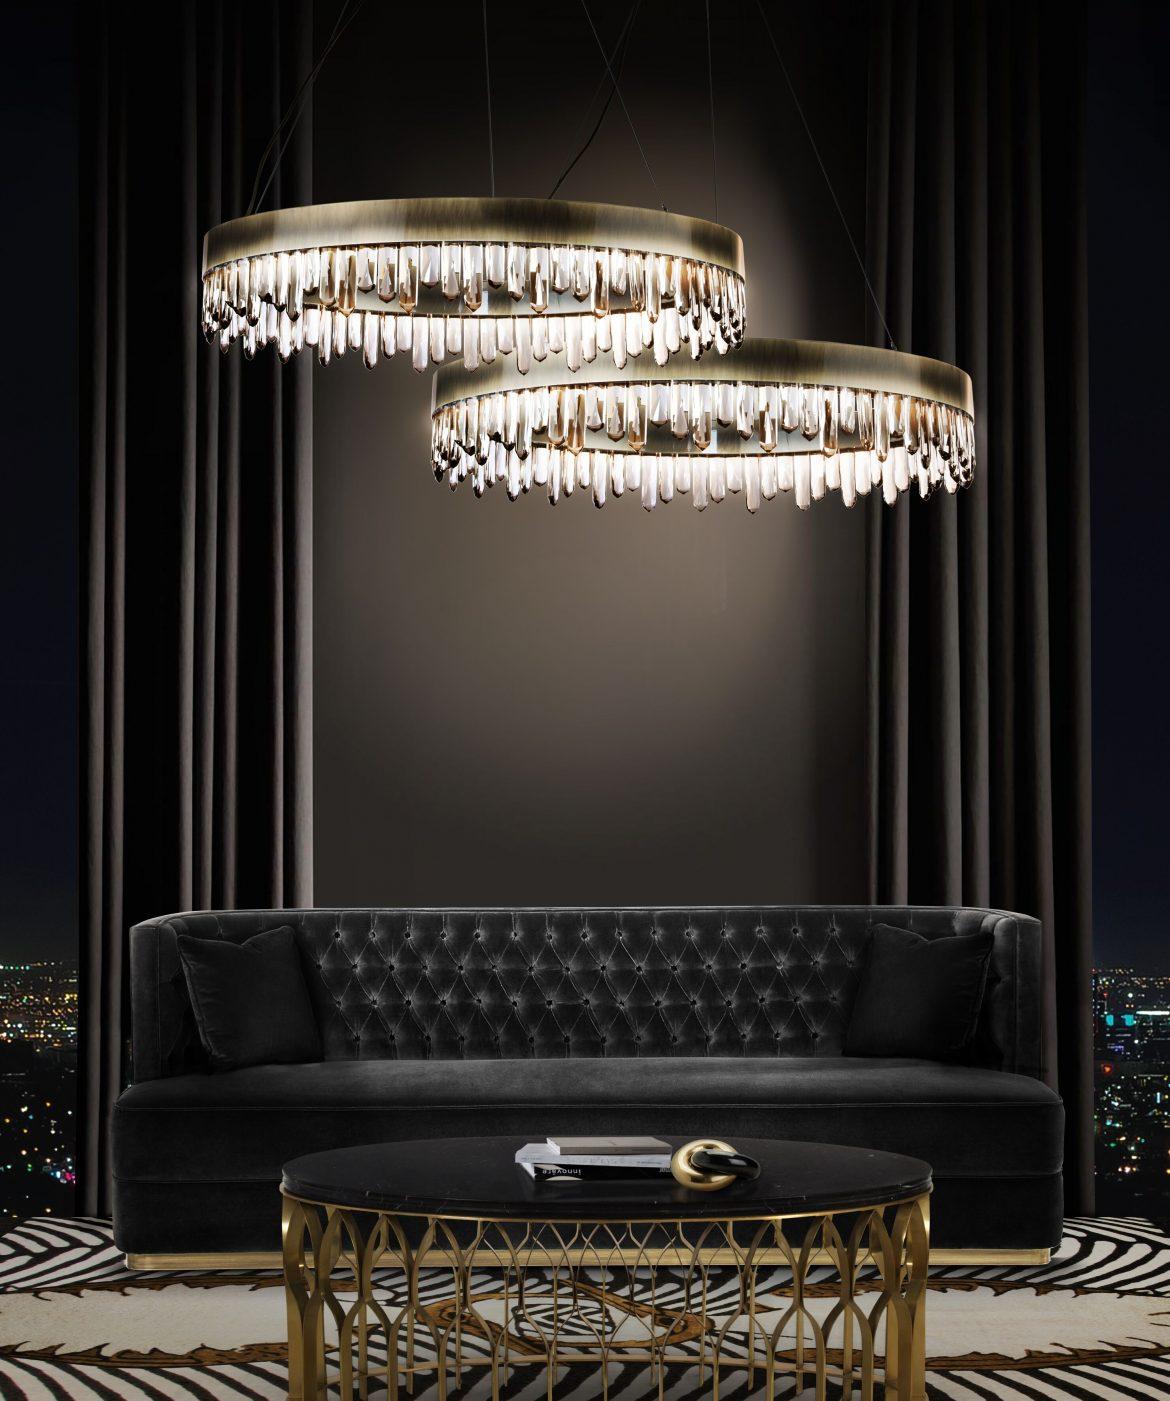 30 Best Living Room Ideas For 2020 living room ideas 30 Best Living Room Ideas For 2020 best living room ideas 2020 7